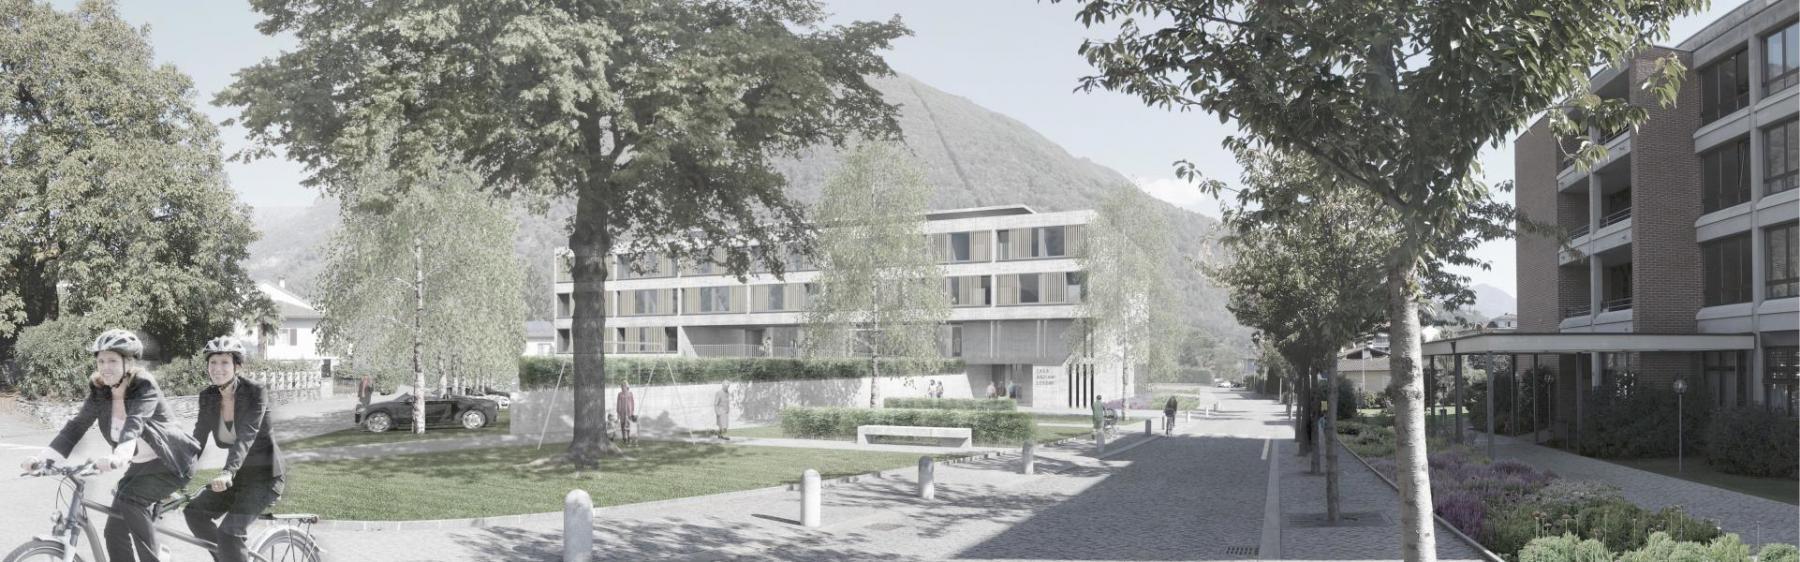 1° rango, 1° acquisto: «Rebatt» (Michele Arnaboldi Architetti)